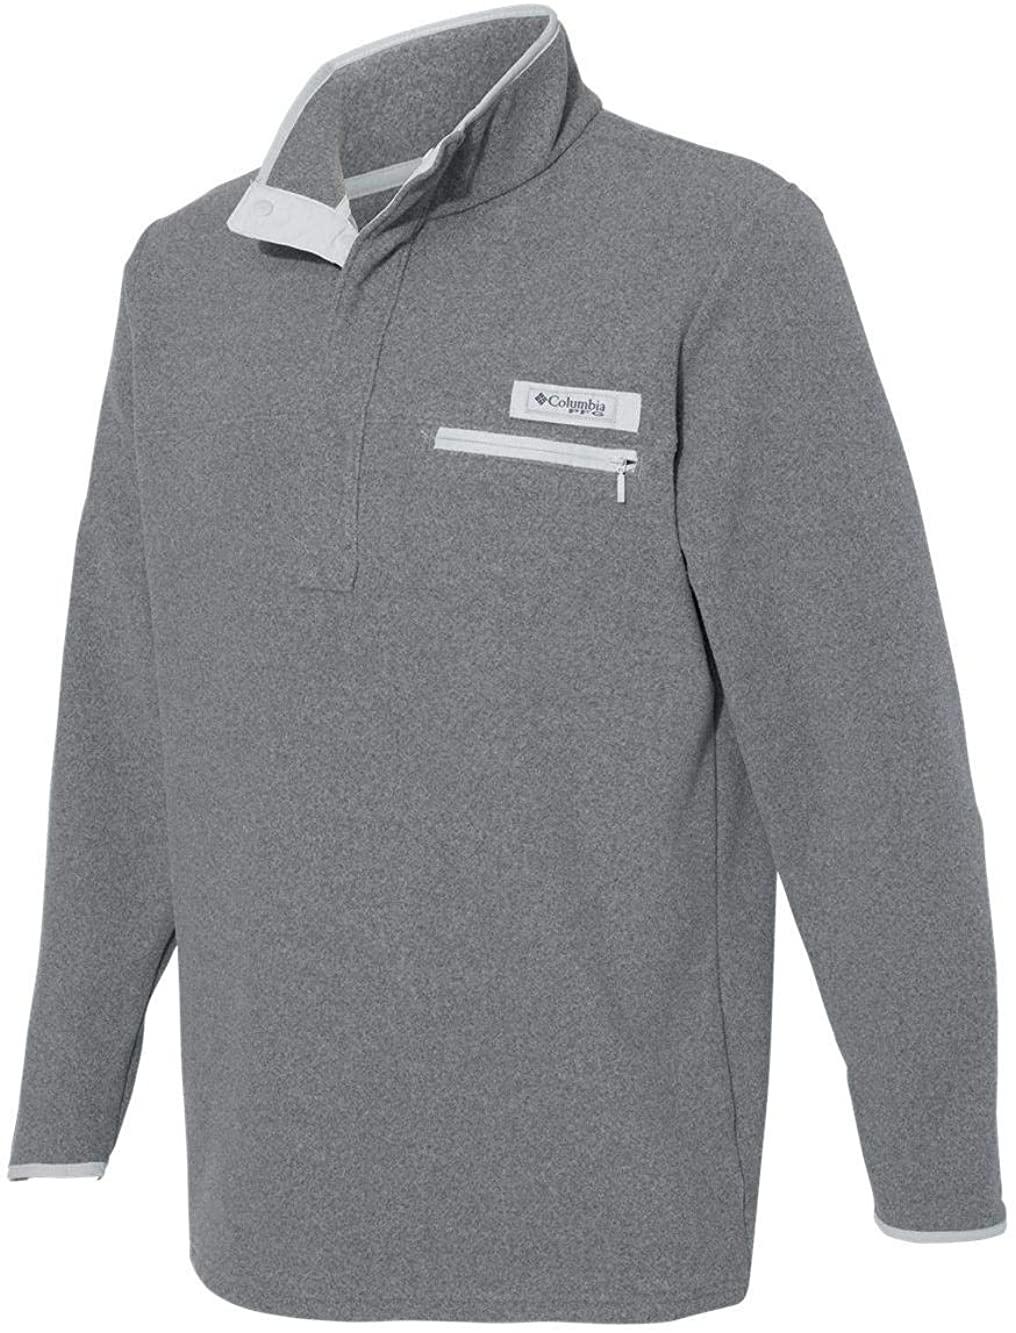 Columbia - PFG Harborside Fleece Pullover - 156757-3X - Cool Grey Heather